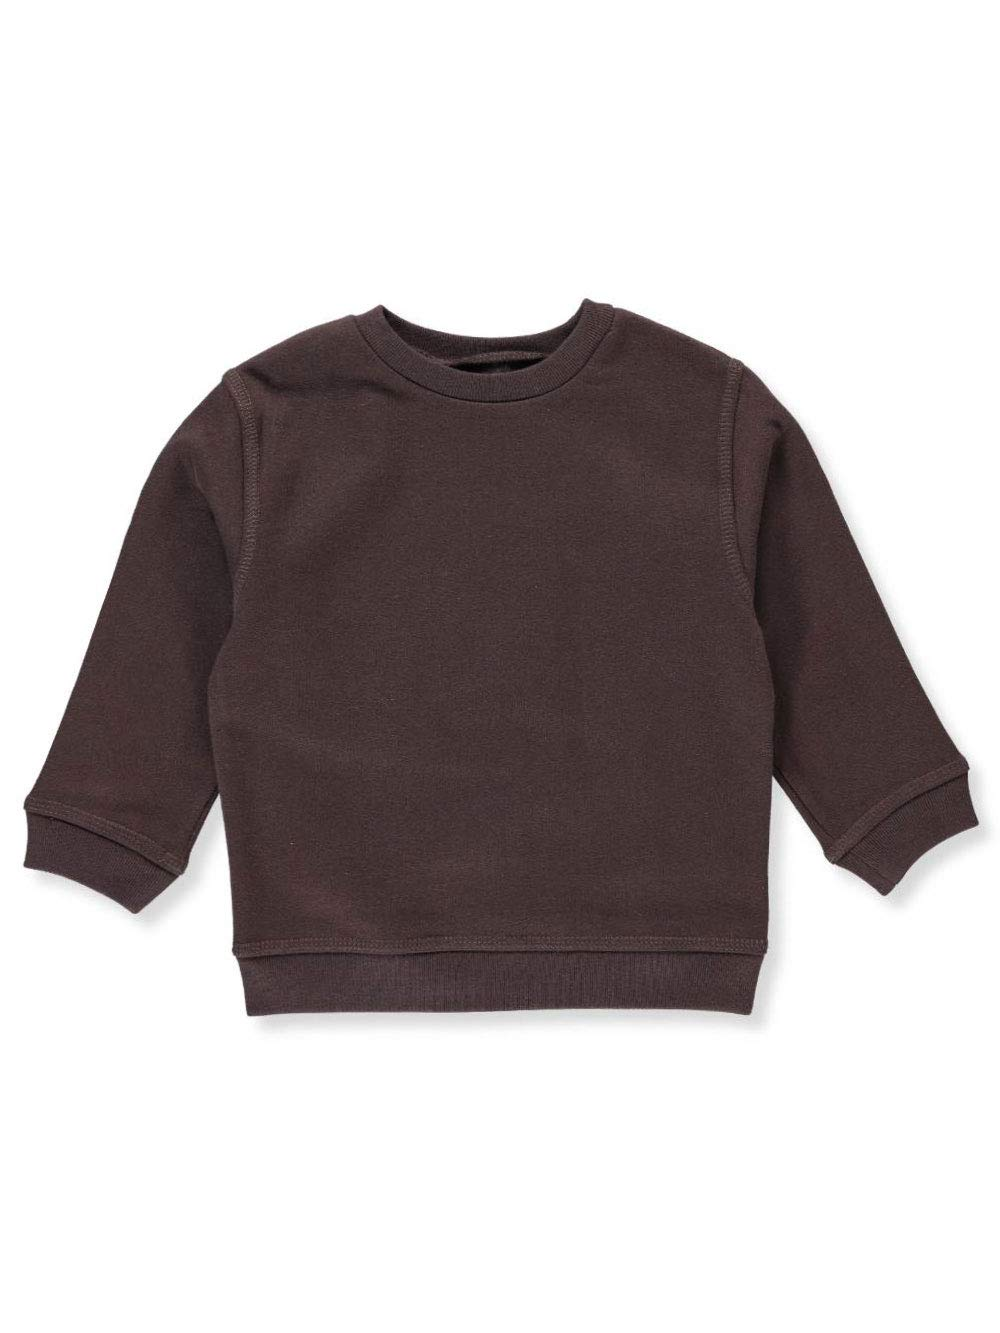 Miniwear Baby Boys' Sweatshirt - brown, 24 months